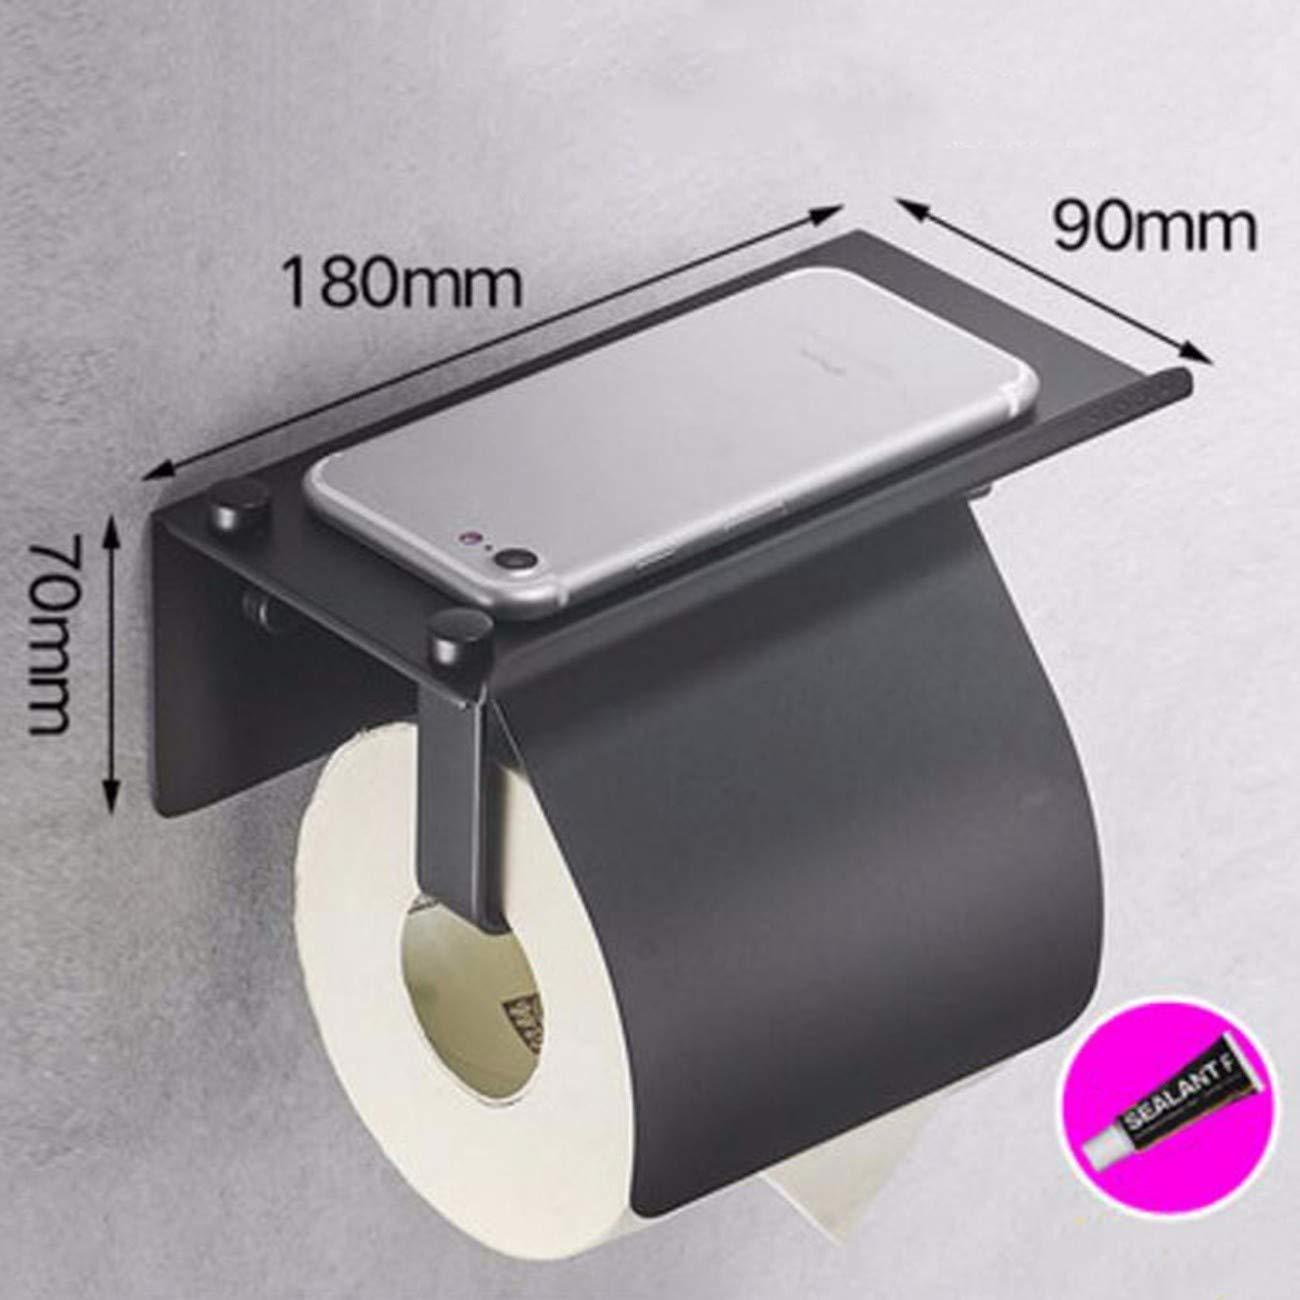 Paper Rack Perforation Nail-Free Copper Mobile Phone Rack Toilet Paper Rack Toilet Paper Towel Rack Carton N